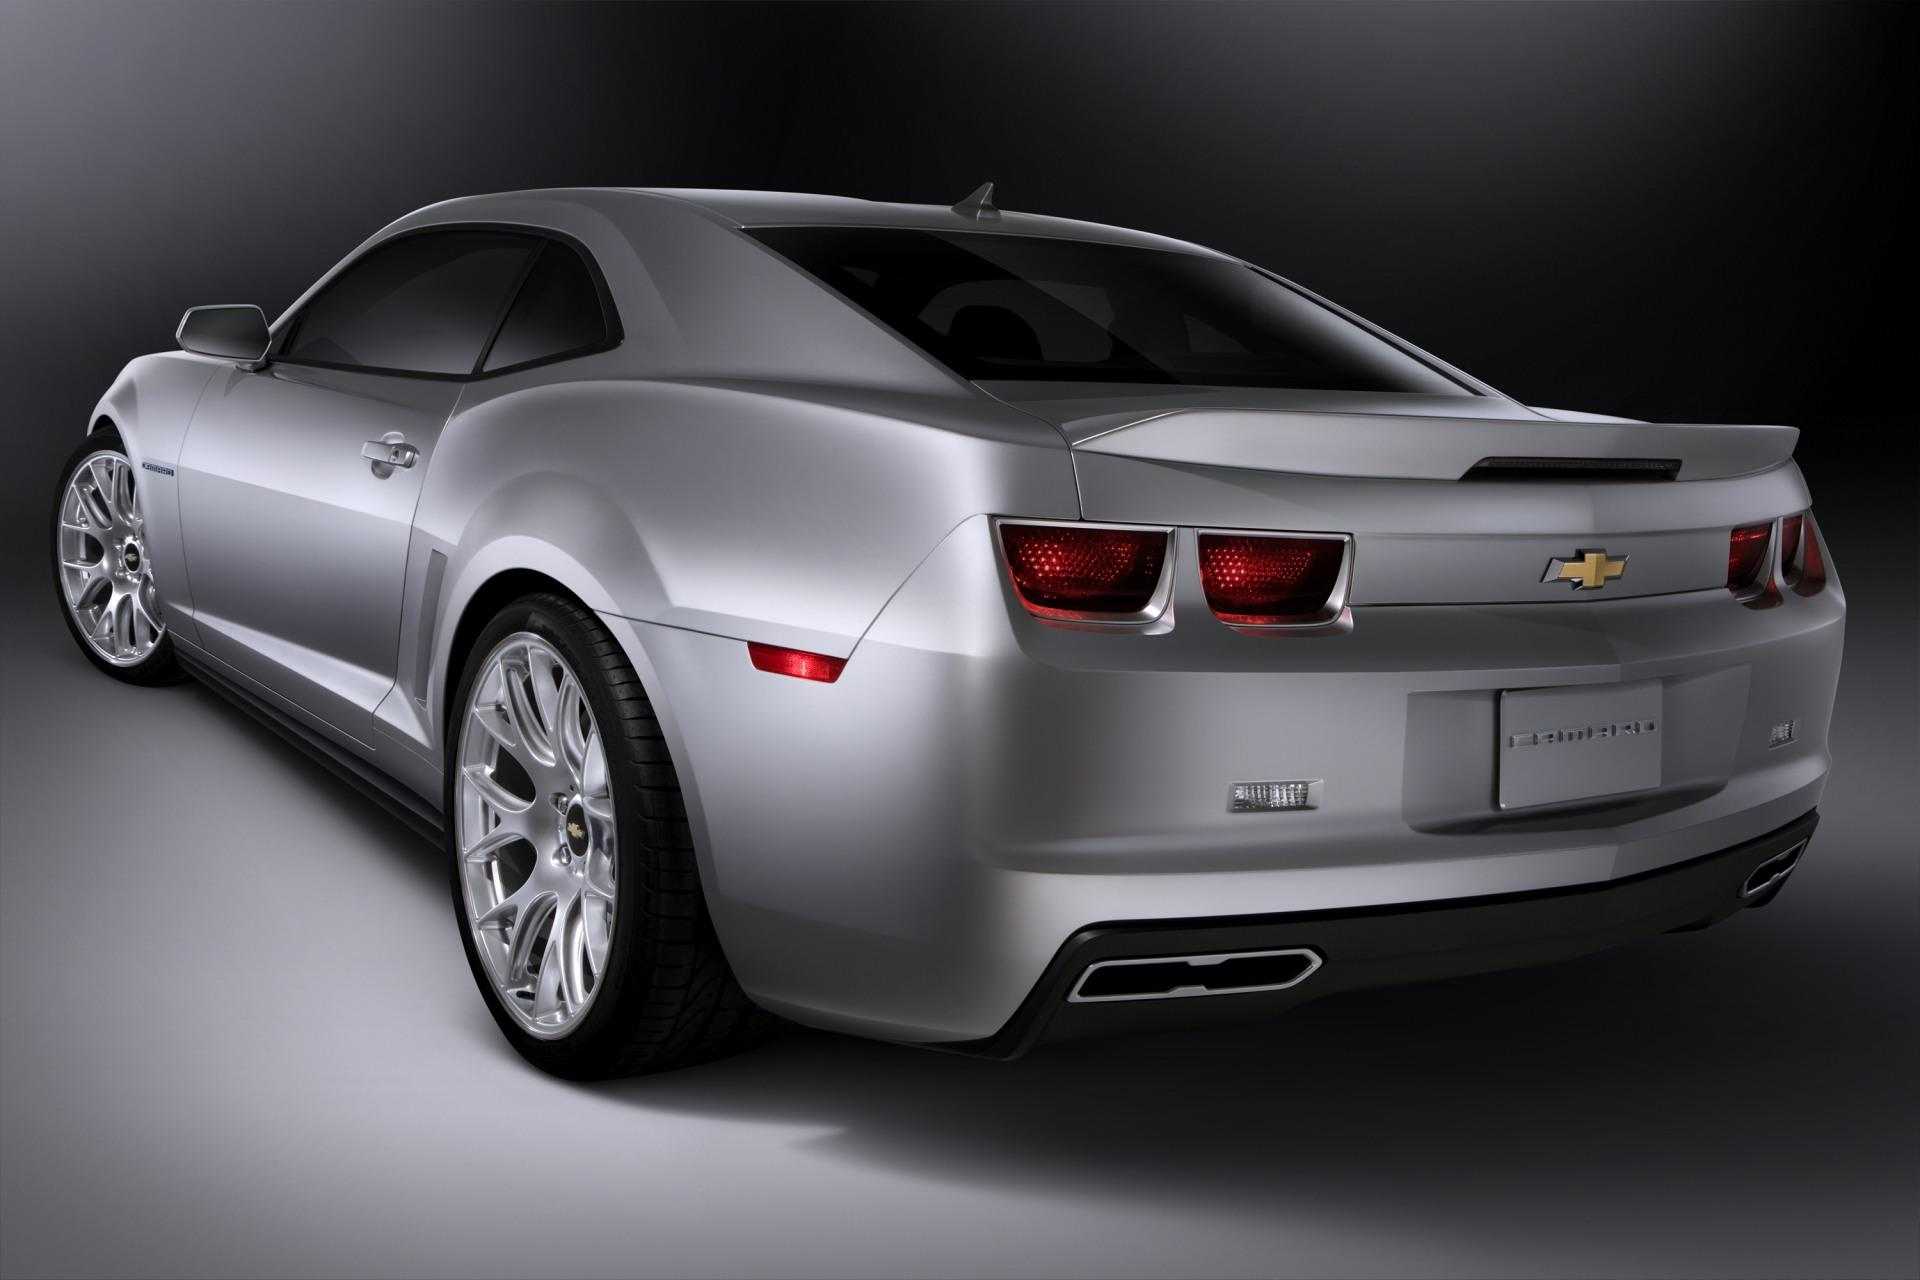 2010 Chevrolet Jay Leno Camaro Concept